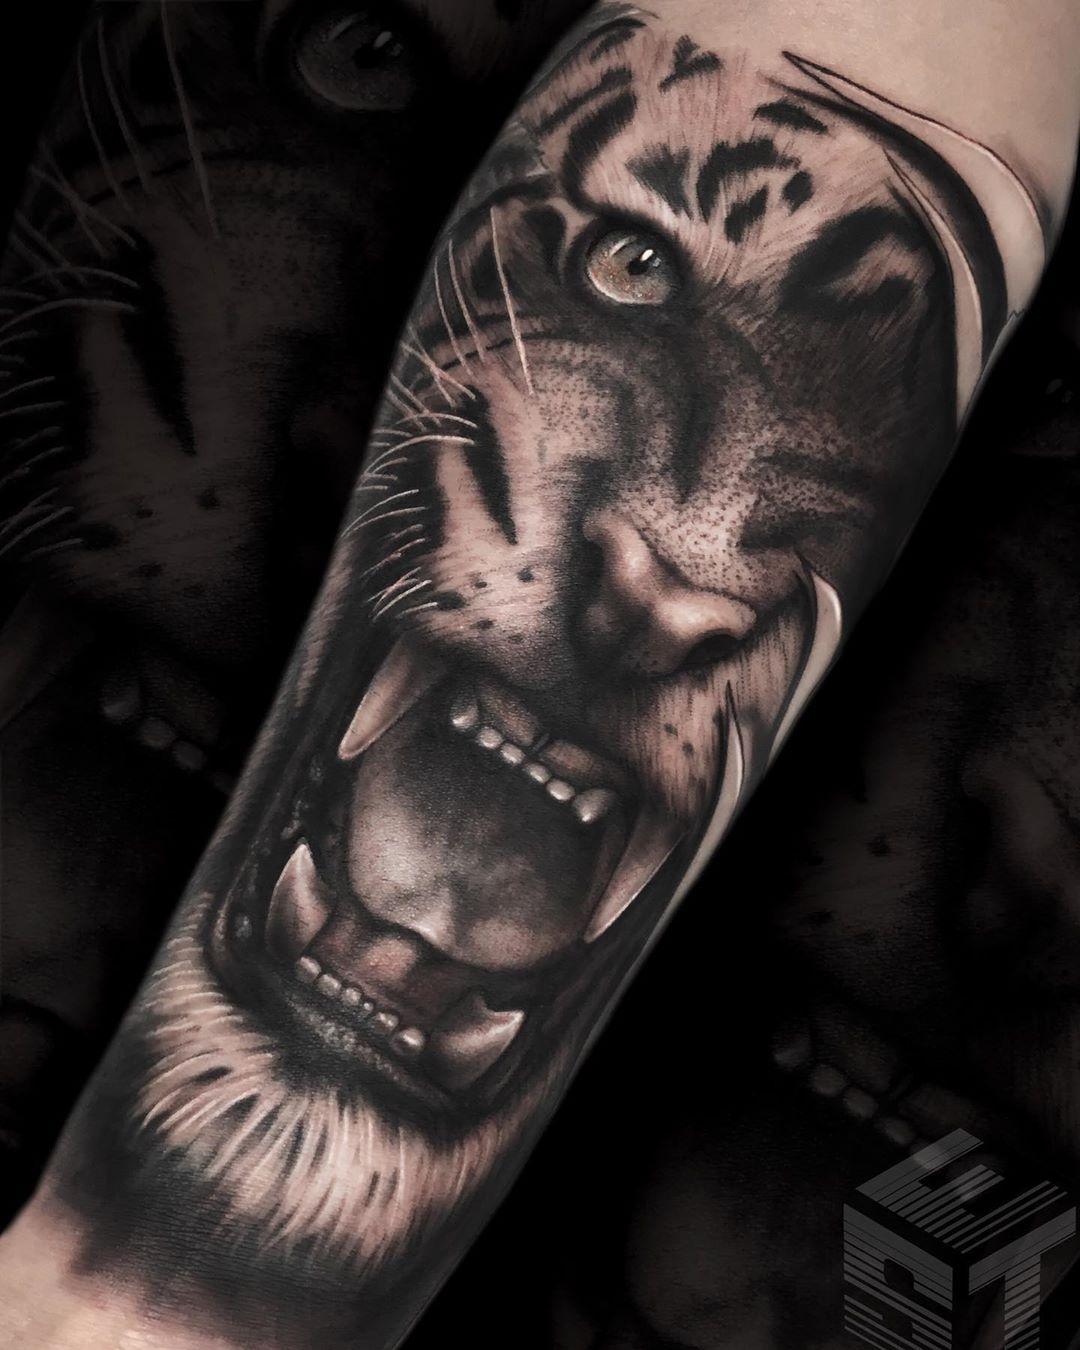 Realizado en @el_salvador_tattoo!! Gracias Roales por la confianza!! . . CITAS E INFO: ✉️MD  Elsalvadortattoo@gmail.com 🌐www.elsalvadortattoo.com 📌PLAZA SALVADOR 14 - LEGANÉS . . #tigretattoo #tigertattoo #realistictattoo #realismotattoo #blackandgreytattoo #tattoooftheday #bng #tattoodo #sullenclothing #inkedmag #inked #inkstagram #tattooartist #tattooed #tattoolove #tattooshop #tattoospain #tattooist #inktattoo #tattoorealistic #spain #madrid #leganestattoo